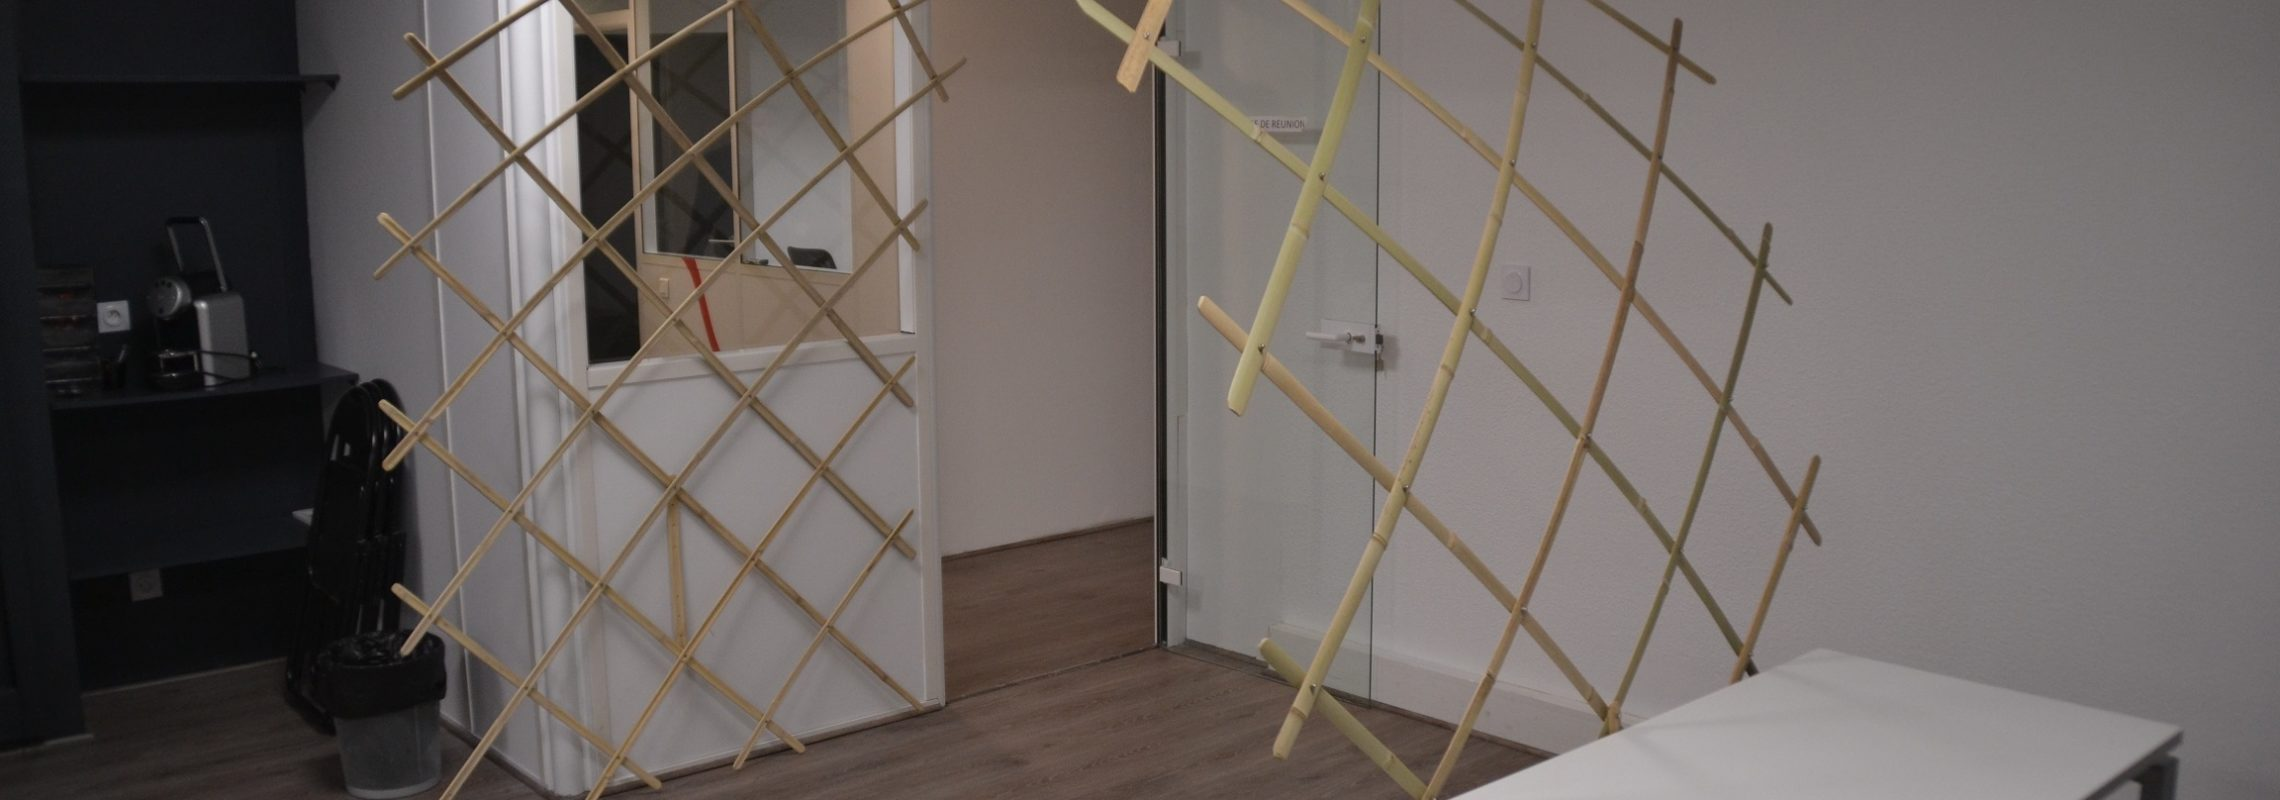 Arche en treillis en bambou, CPME31 - Bambou Créations